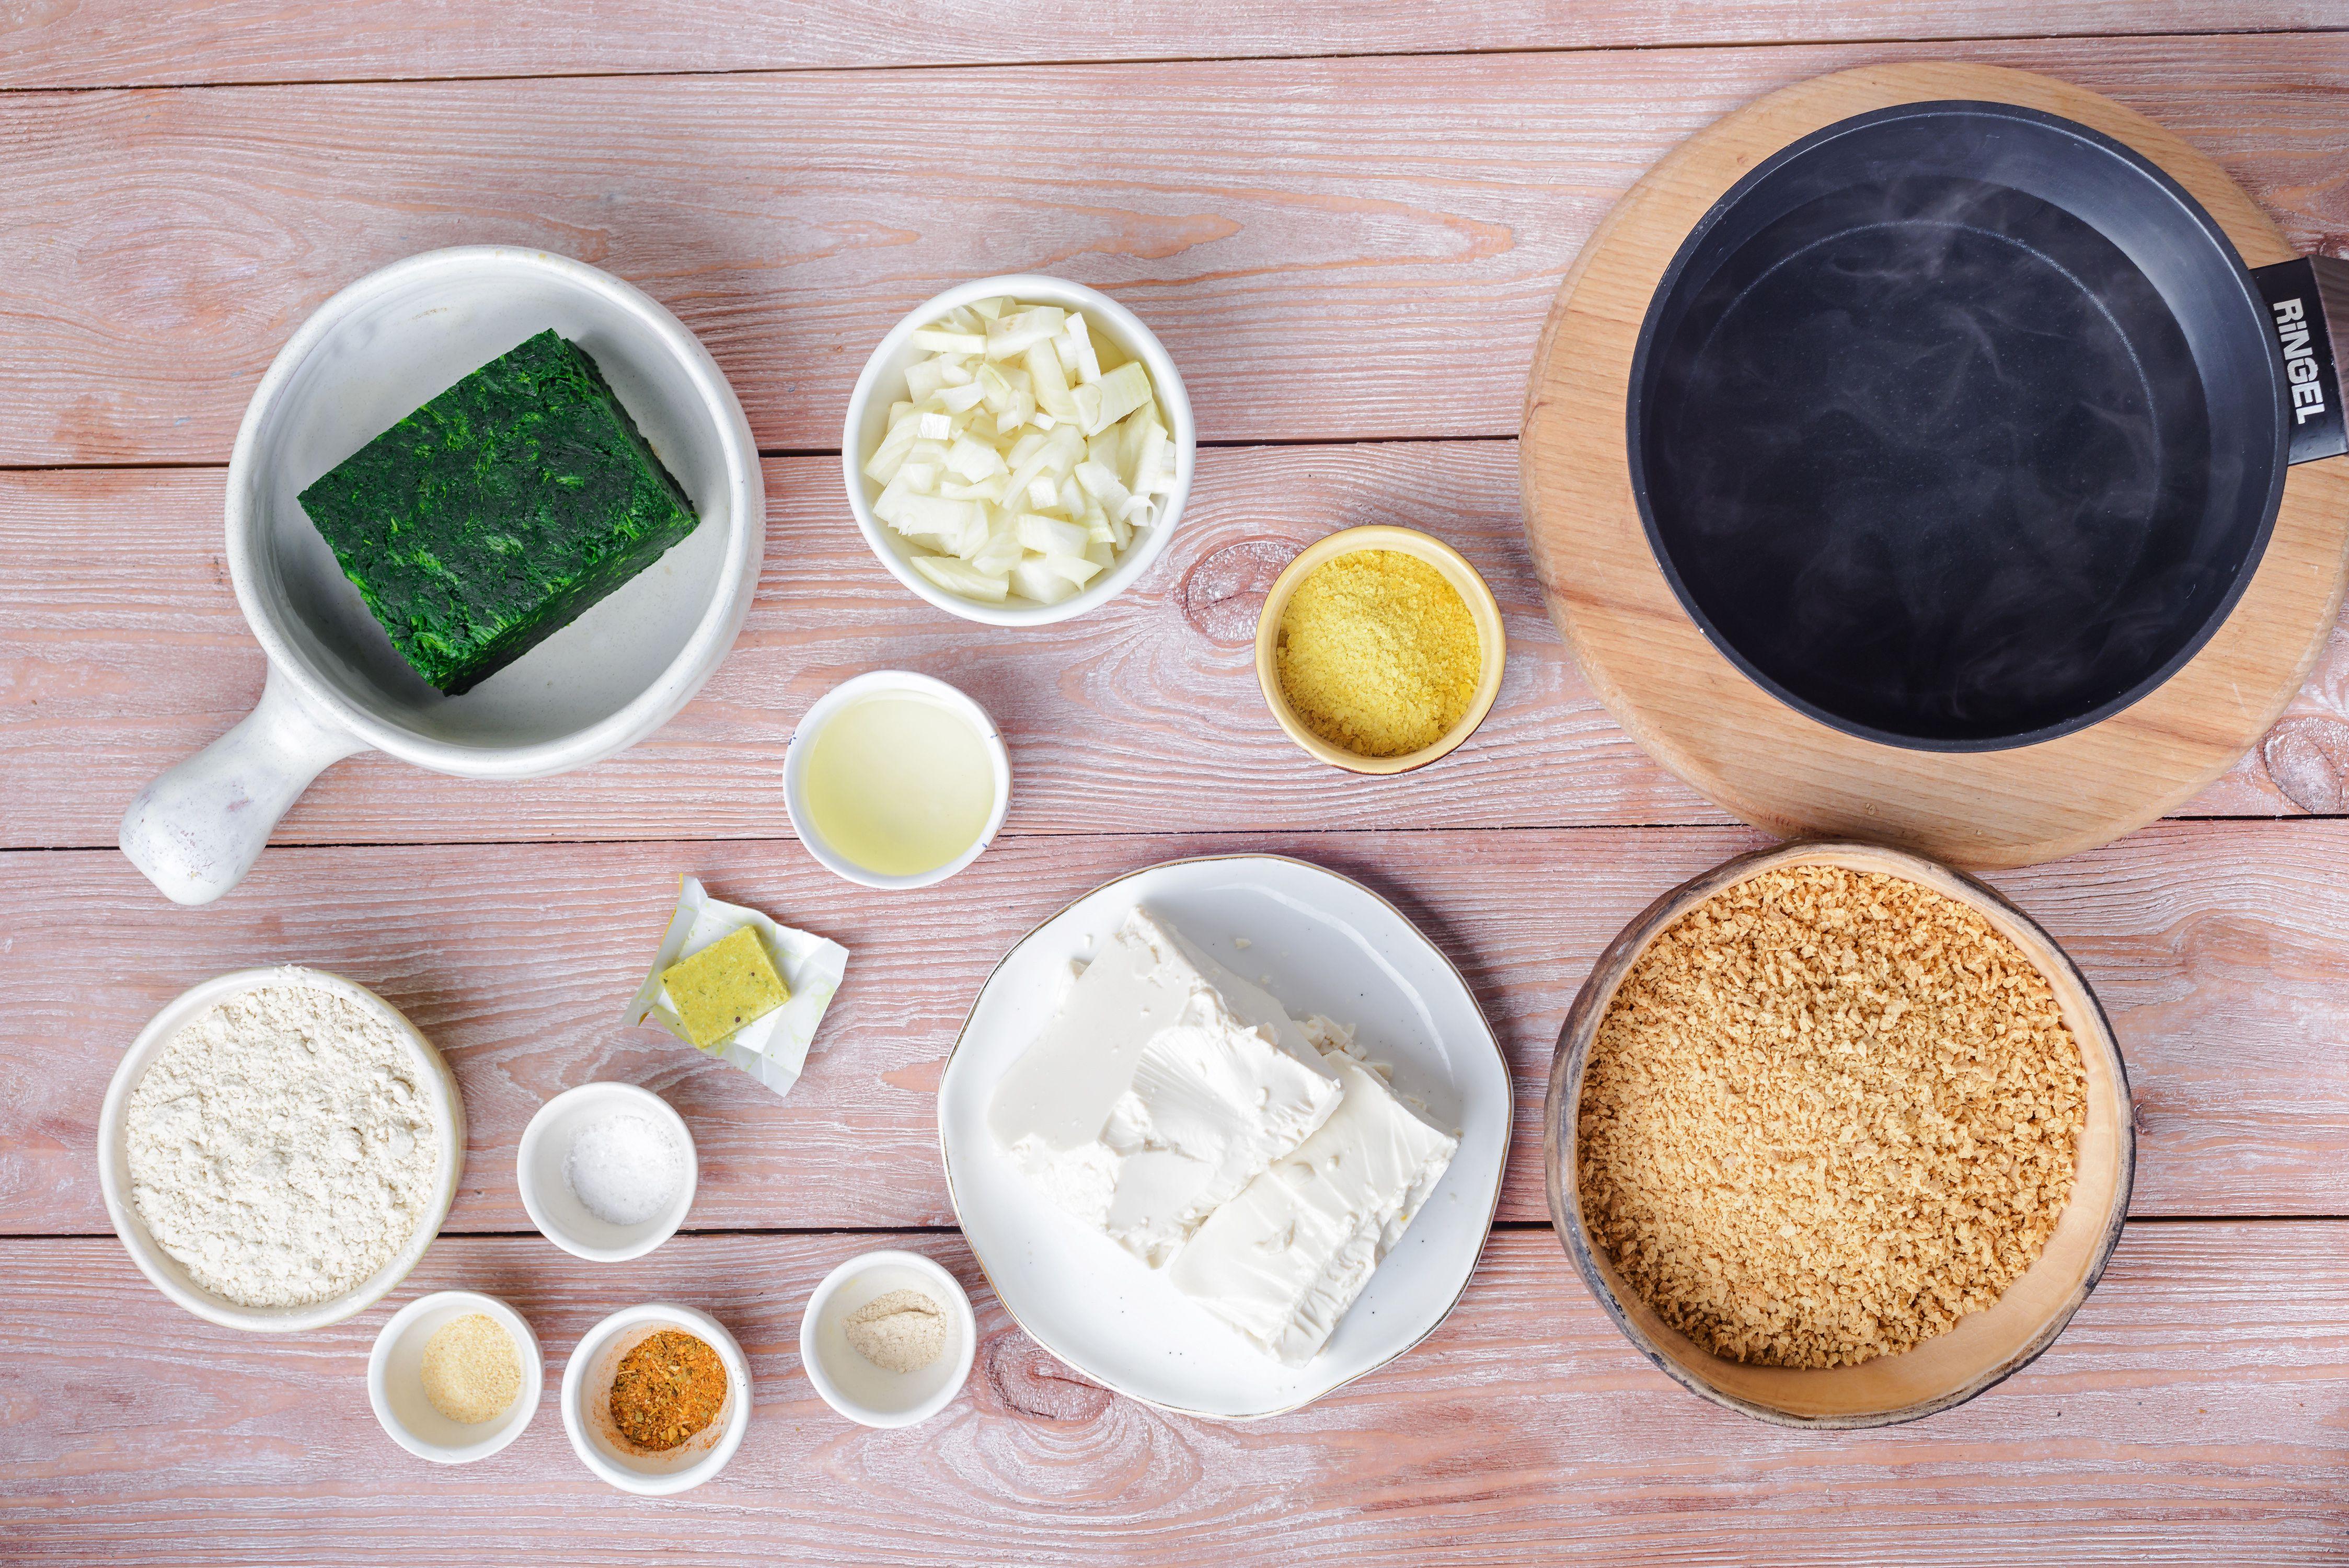 Vegan TVP ingredients